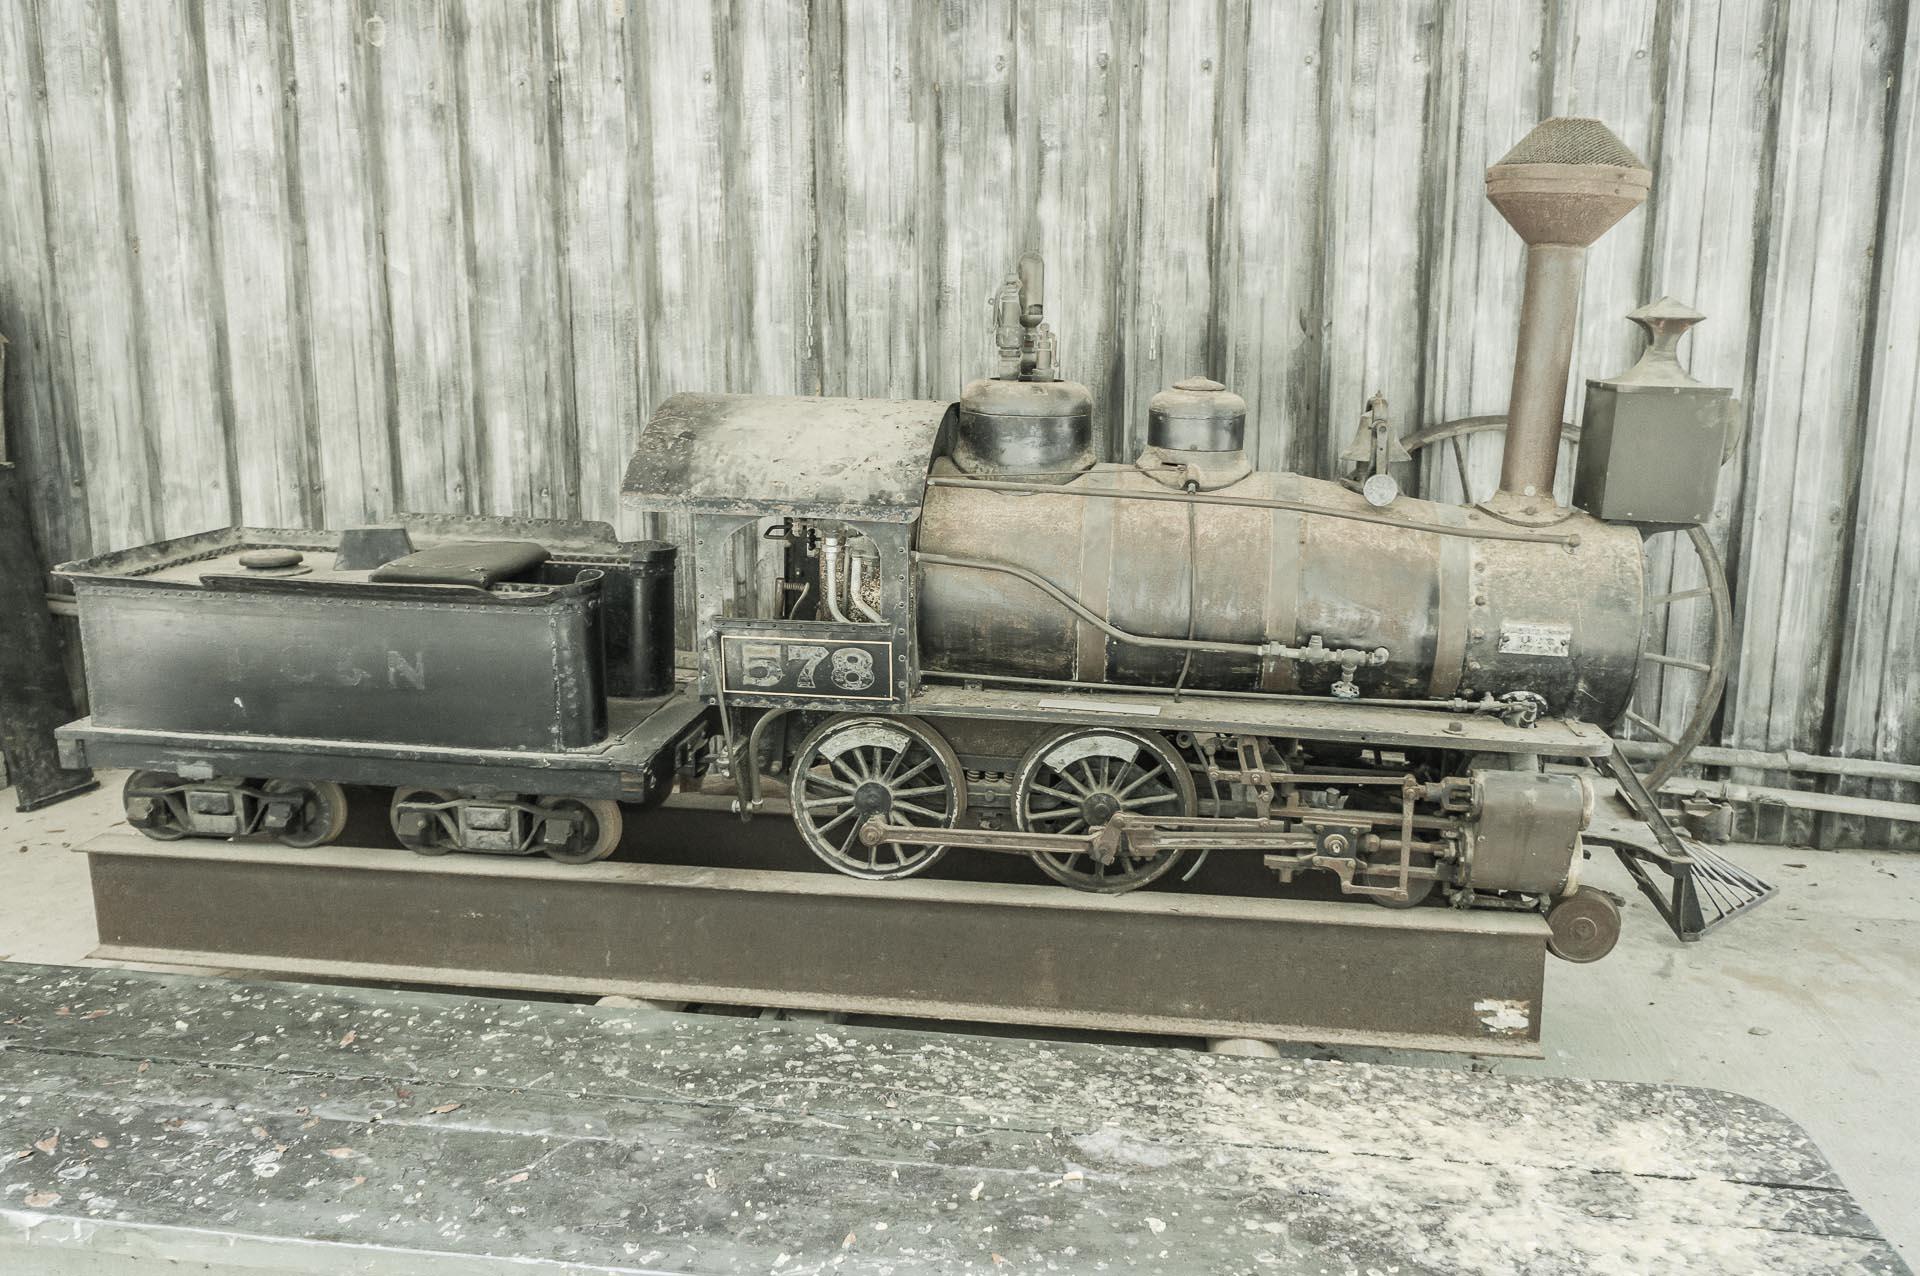 Train at the Rural Life Museum Baton Rouge Louisiana